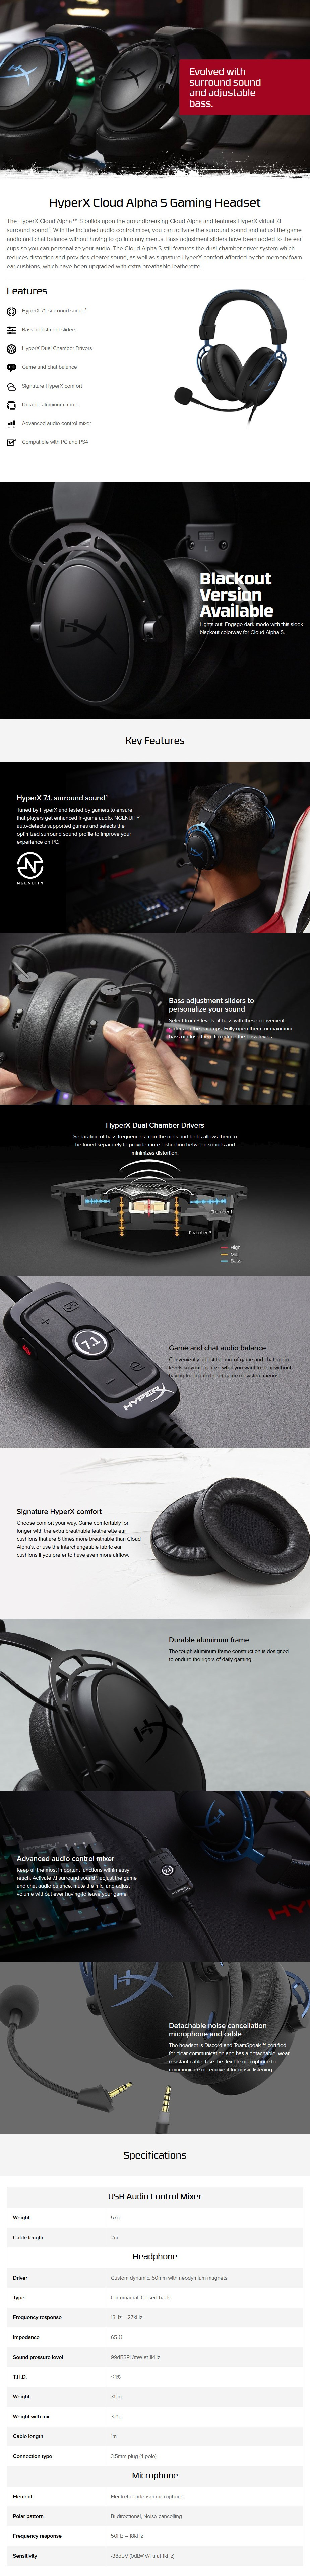 HyperX Cloud Alpha S Gaming Headset - Blackout - Overview 1